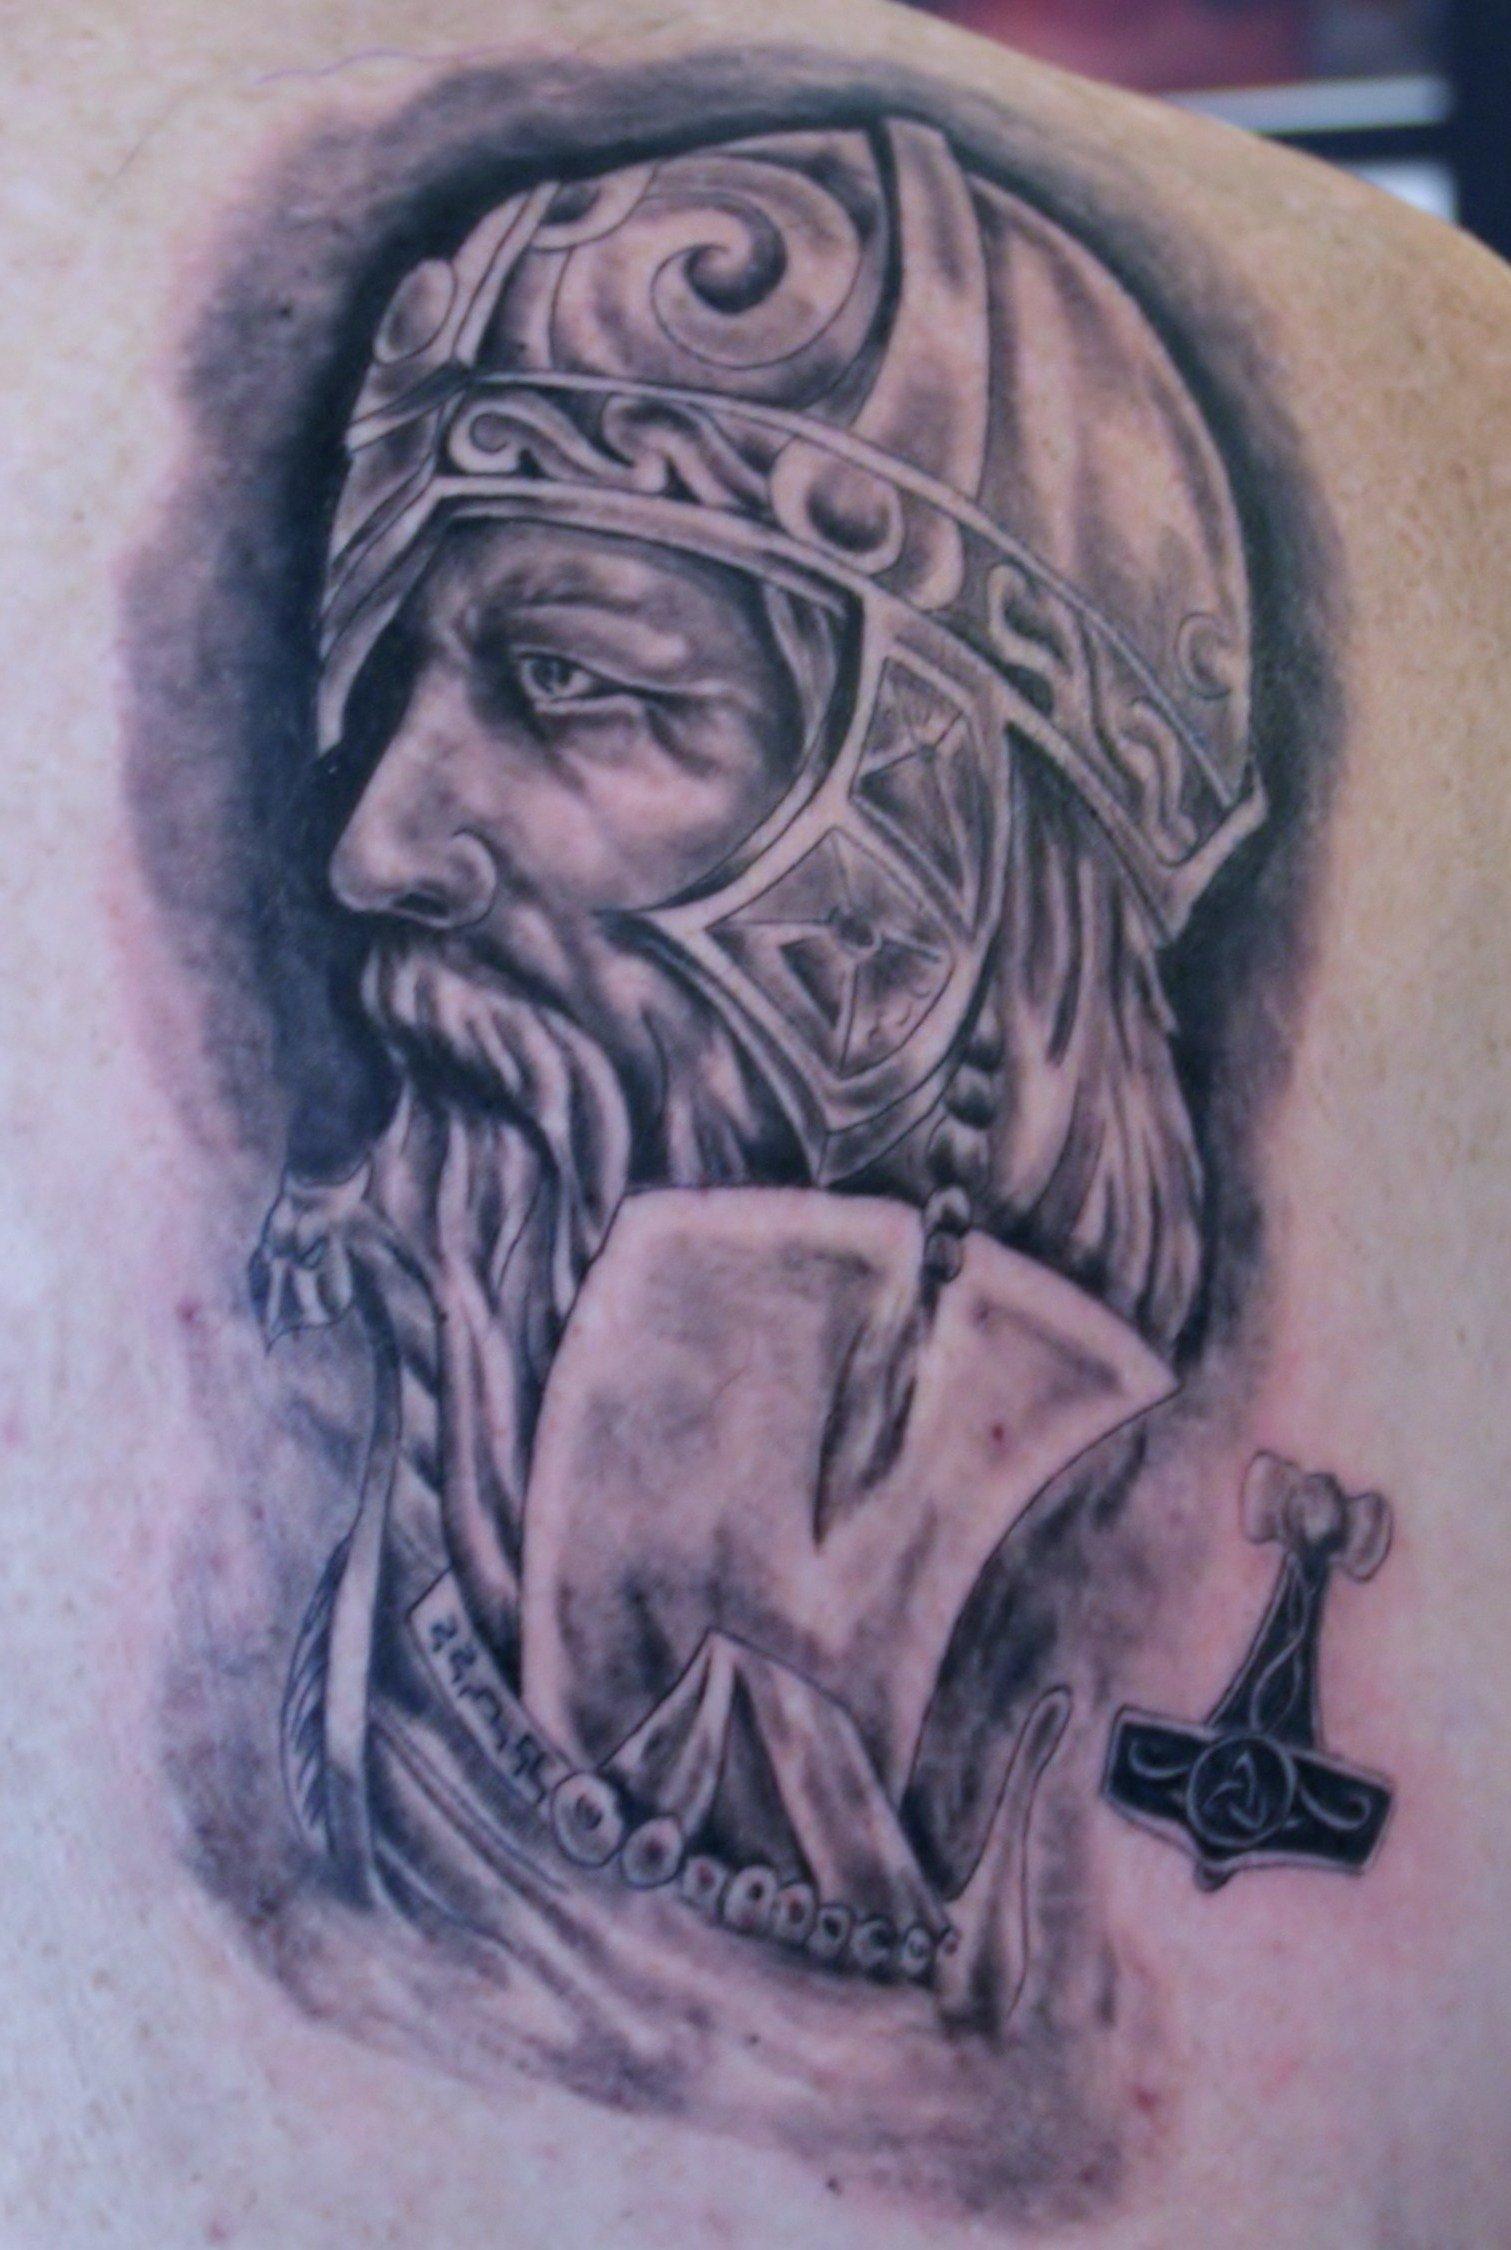 Wikinger tattoo Motive - Odin